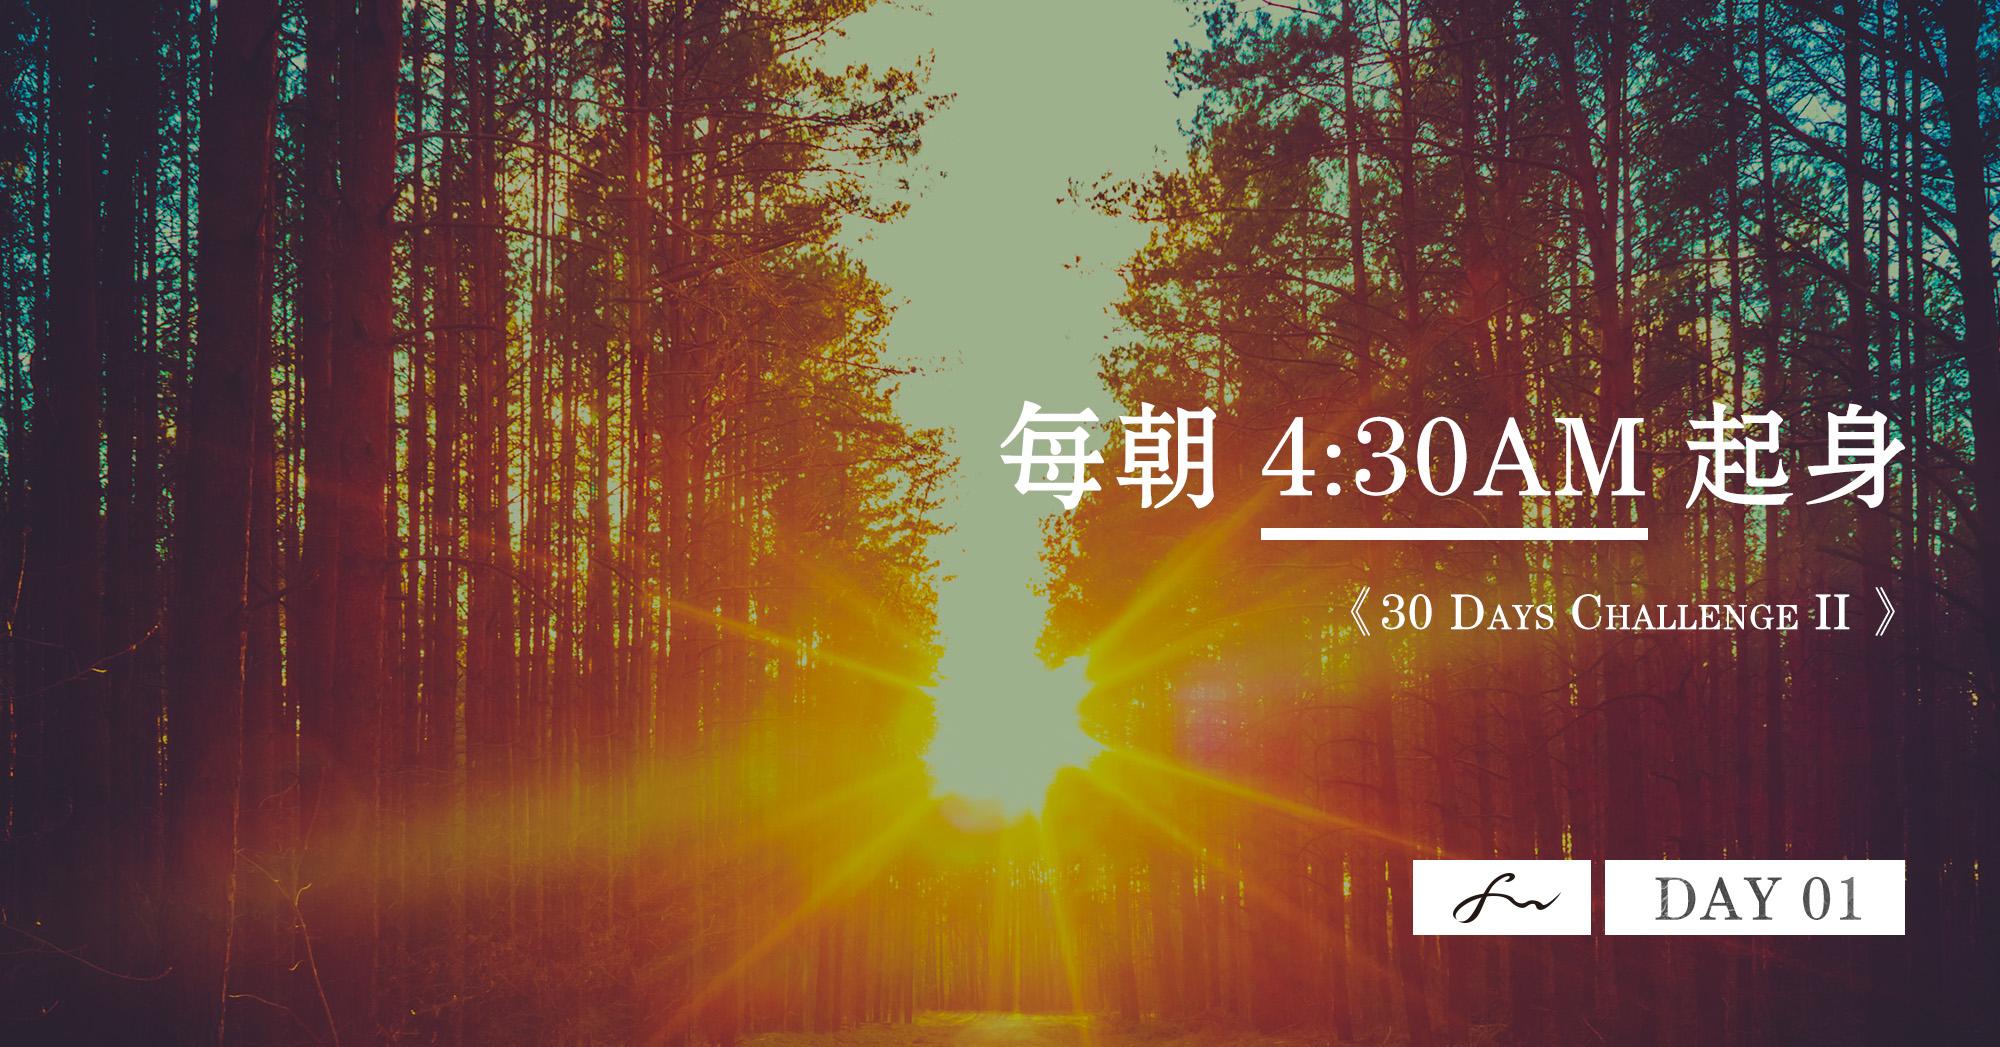 30 Day Challenge II – Day01每朝4:30AM起身